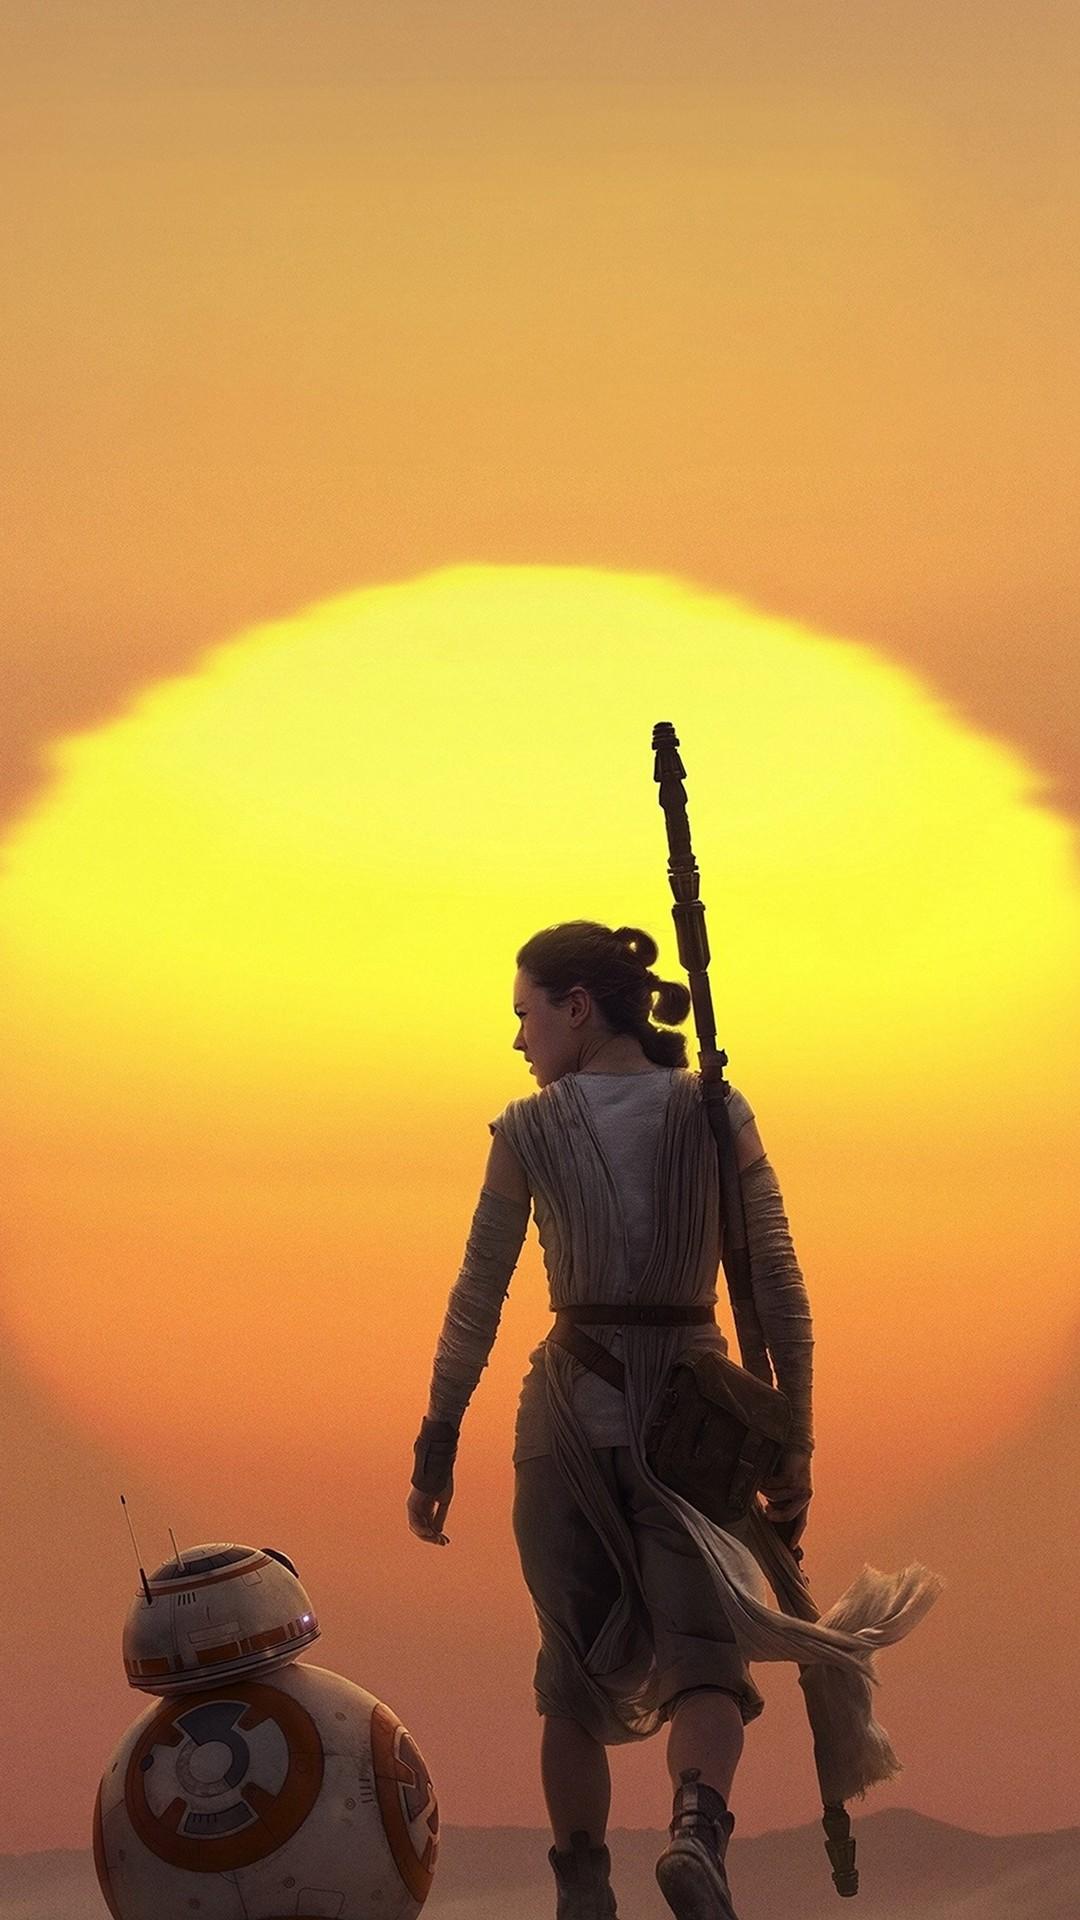 Force Awakens Starwars Art Rey iPhone 6 wallpaper